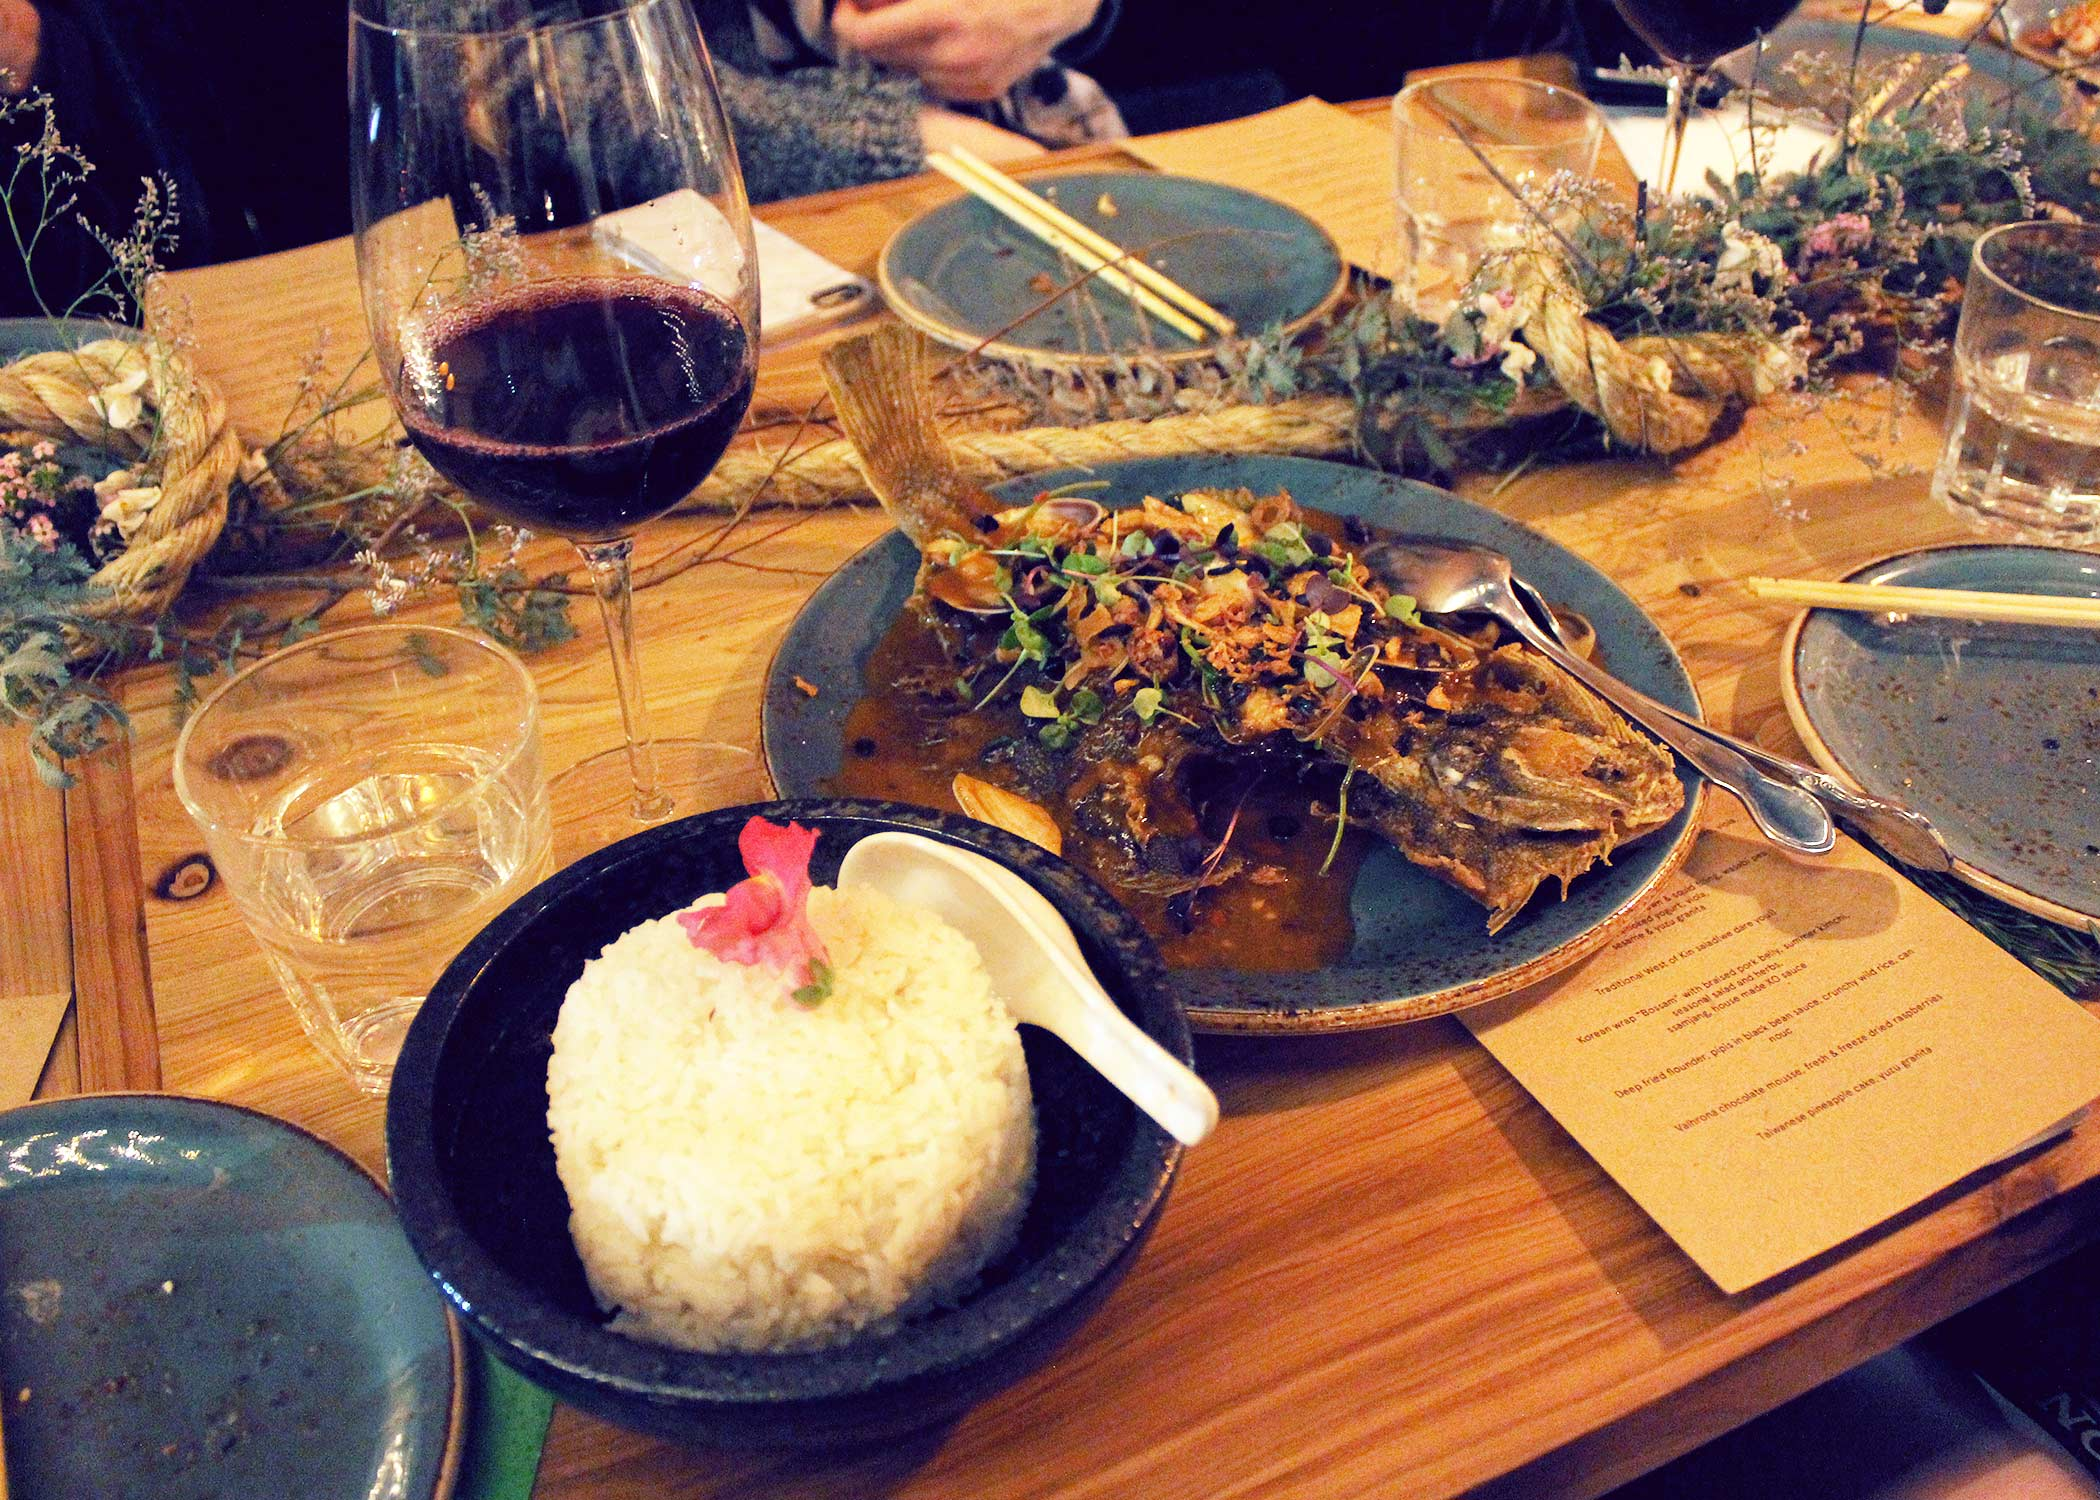 Deep fried flounder, pipis in black bean sauce, crunchy wild rice, can nouc